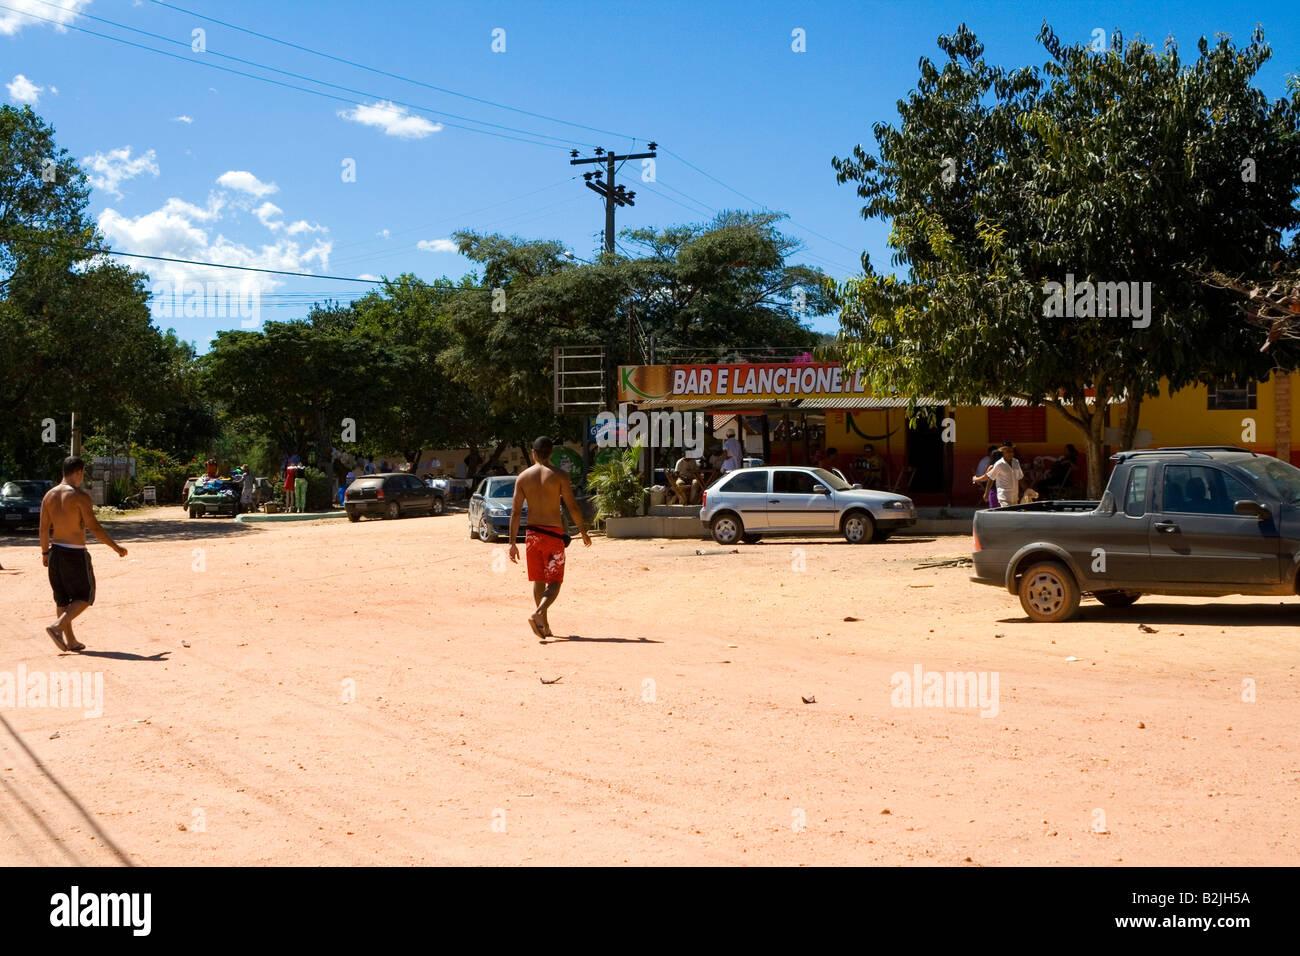 Central Square, Street Scene, Povoado de São Jorge, Goiás, Brazil, South America Stock Photo